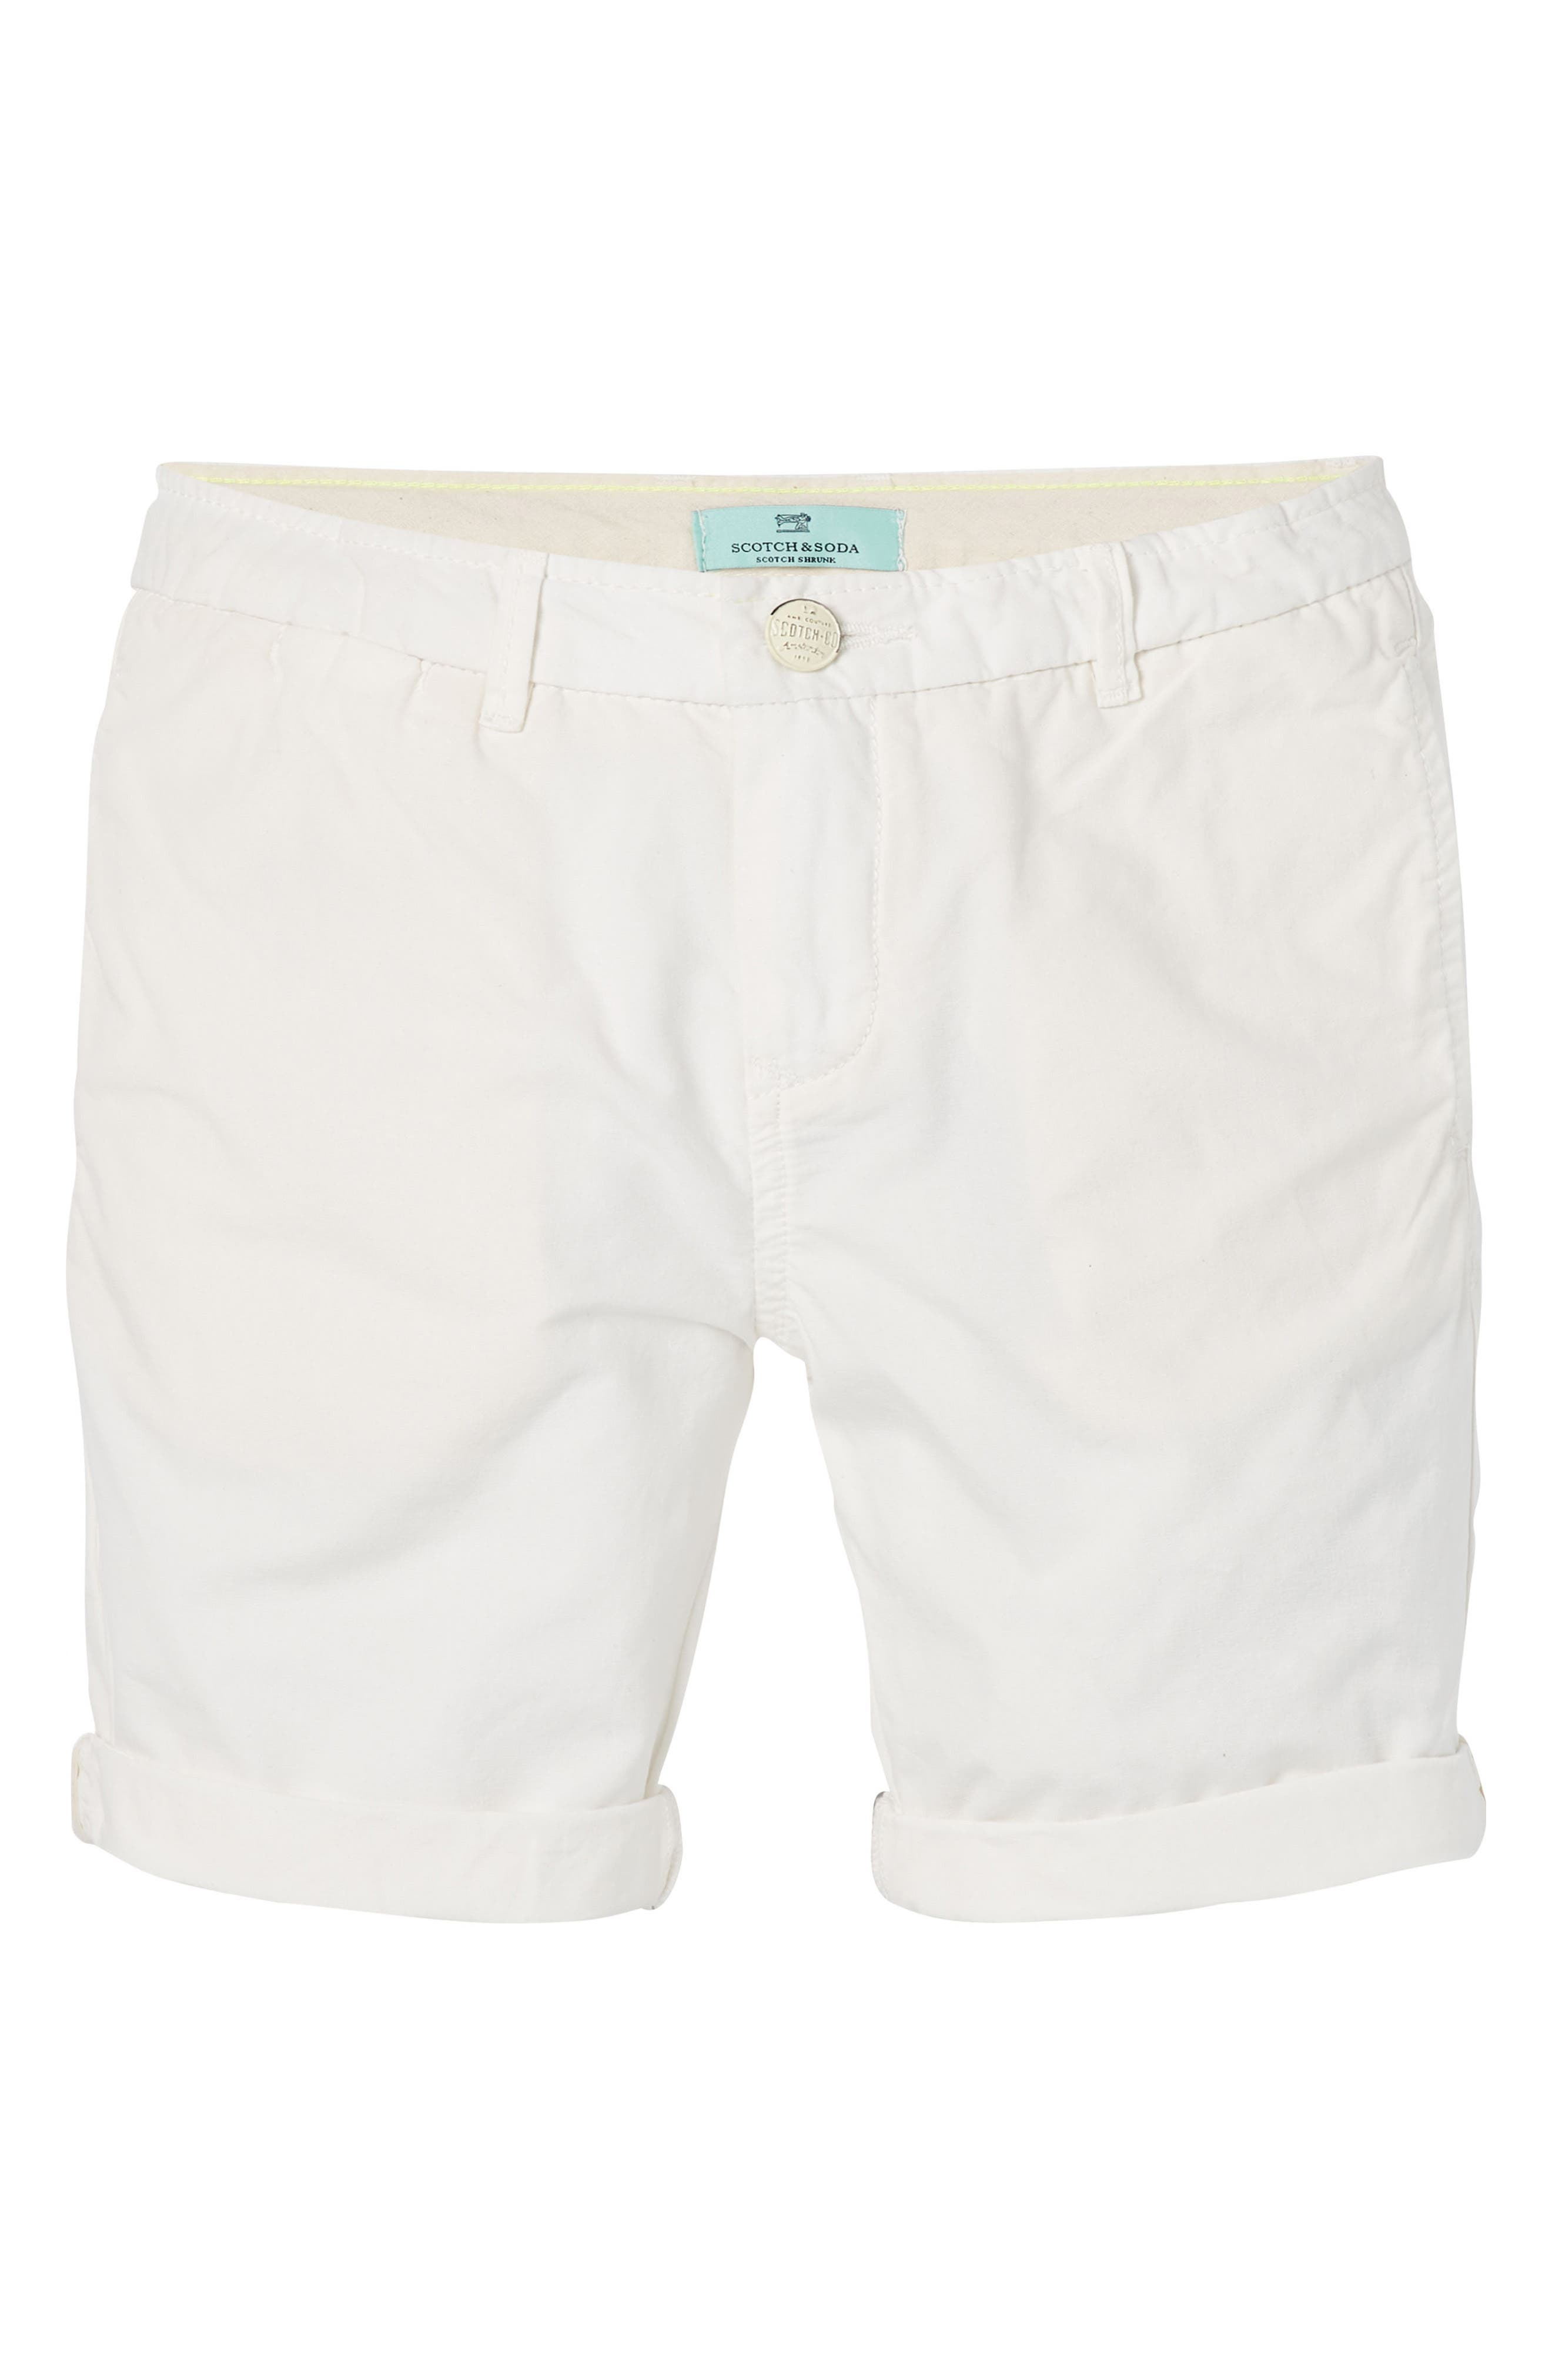 Poplin Shorts,                         Main,                         color, 100